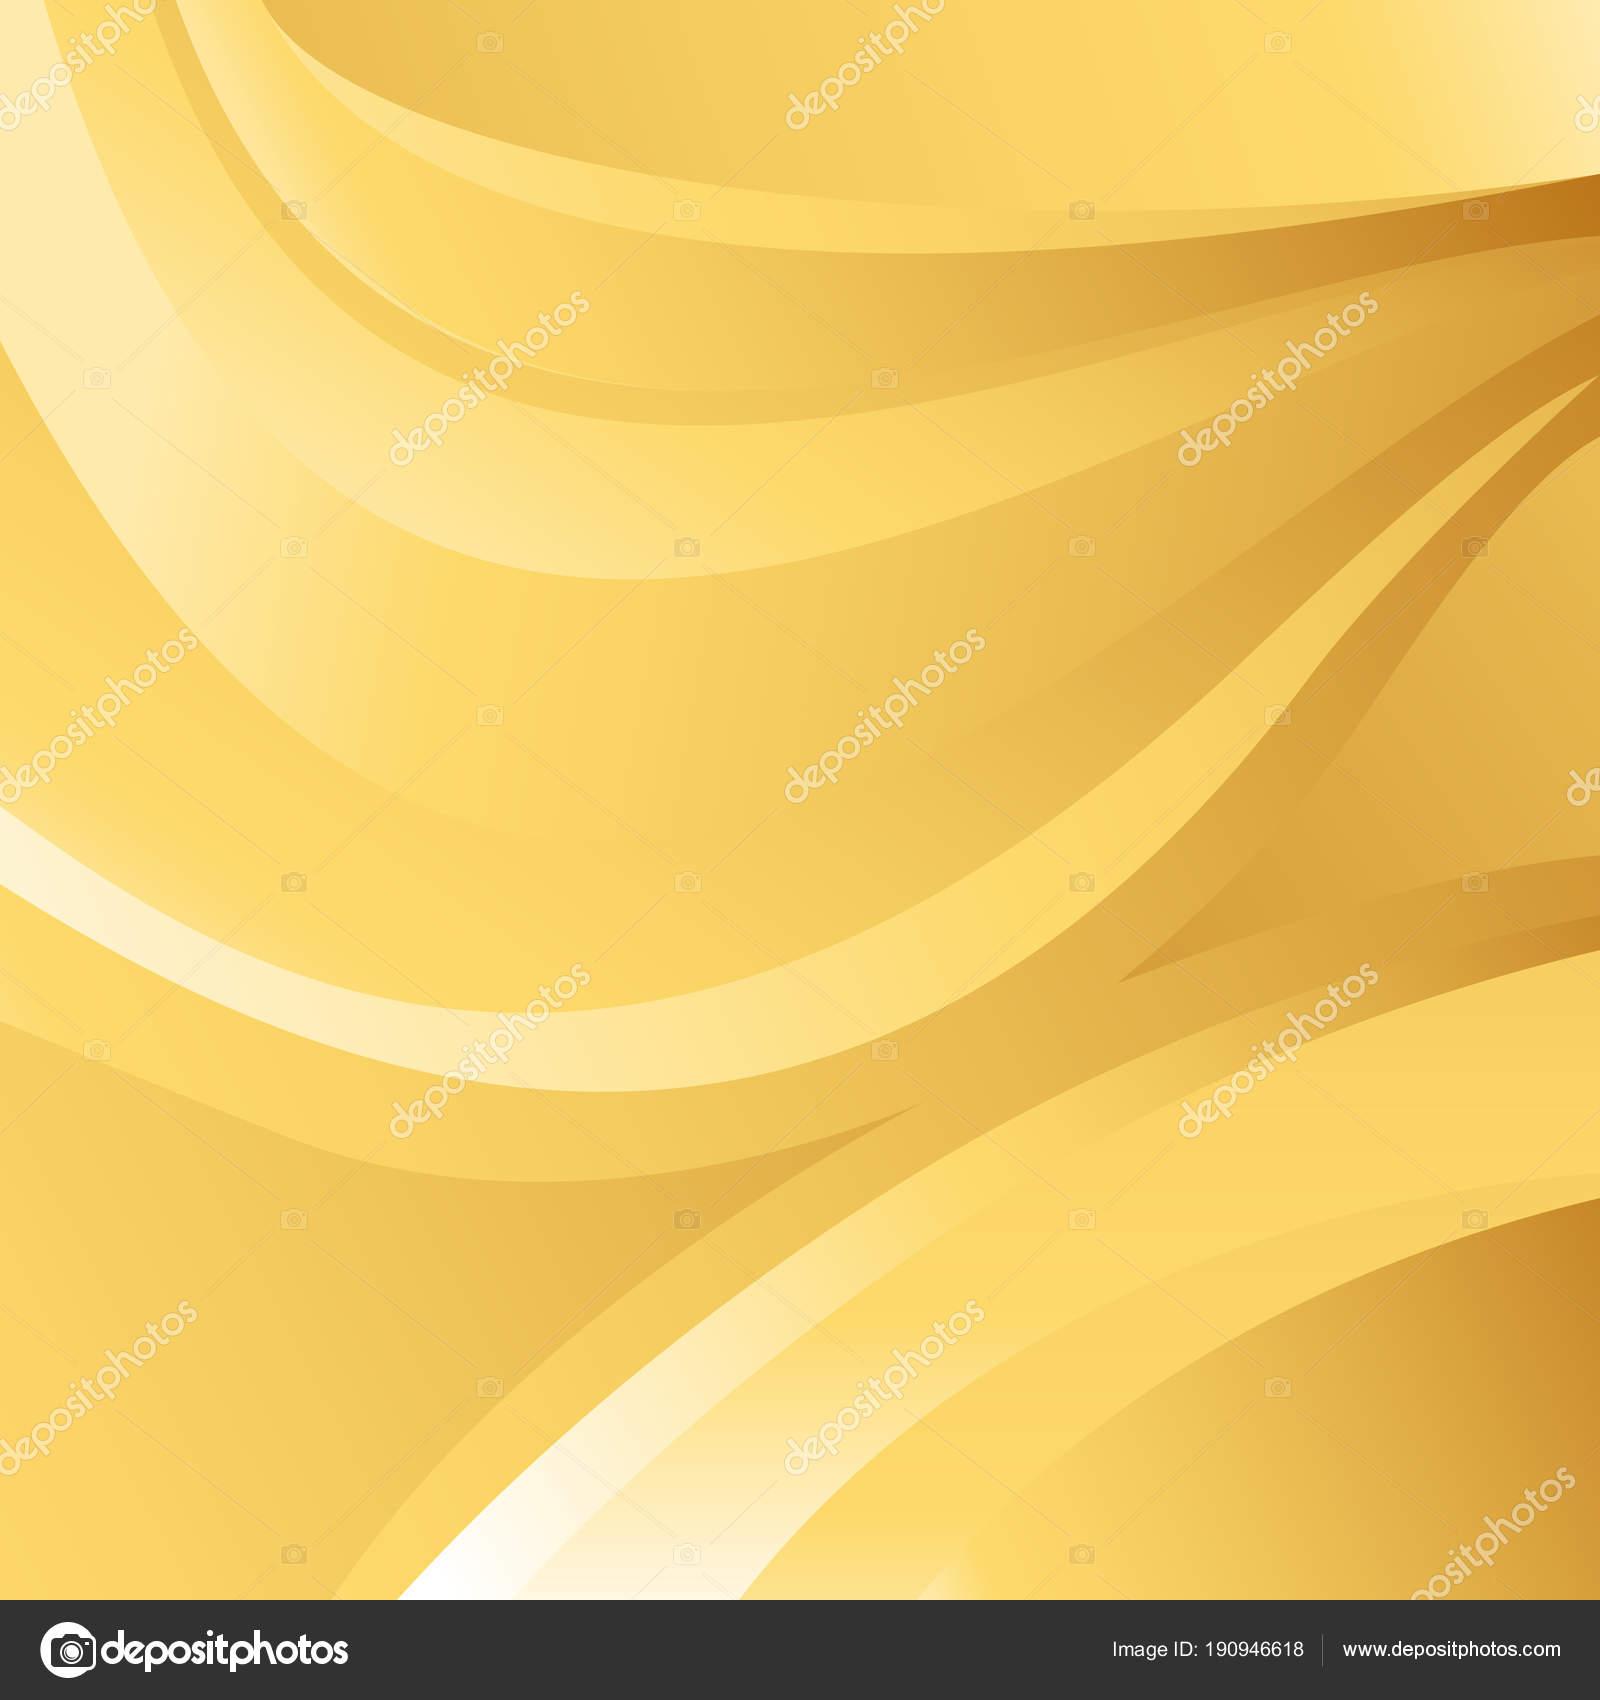 goldwave 4.26 free download